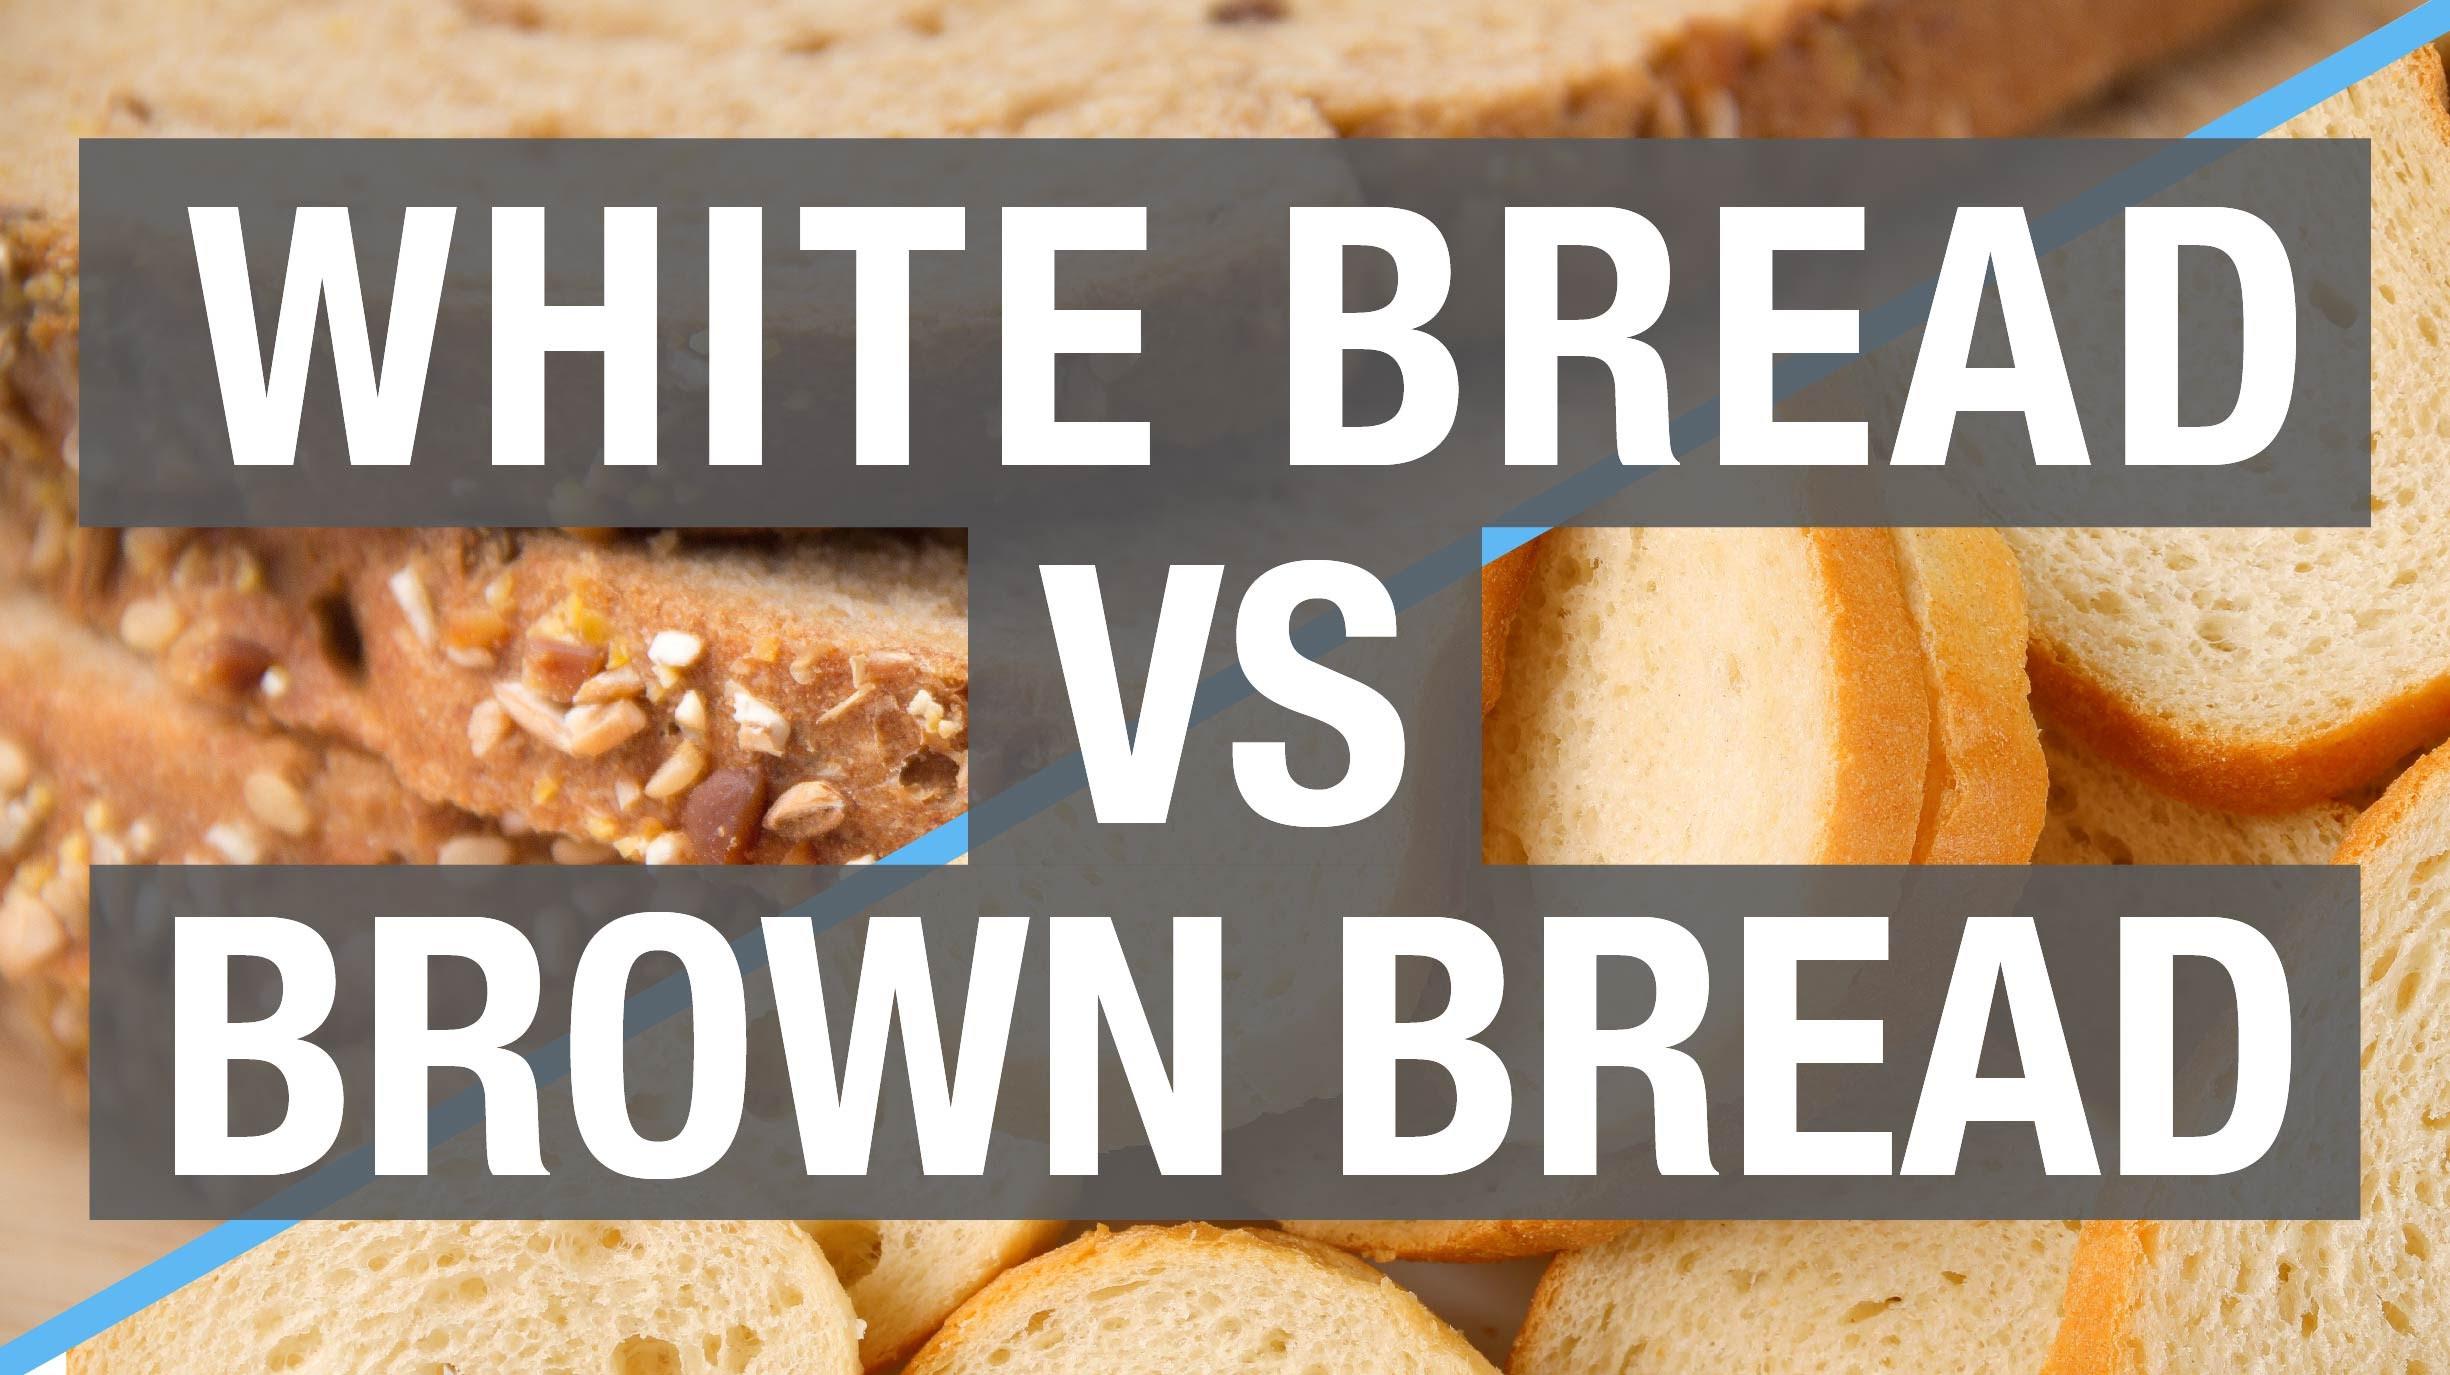 Healthy Life White Bread  White Bread Vs Brown Bread – Is Brown Bread Really